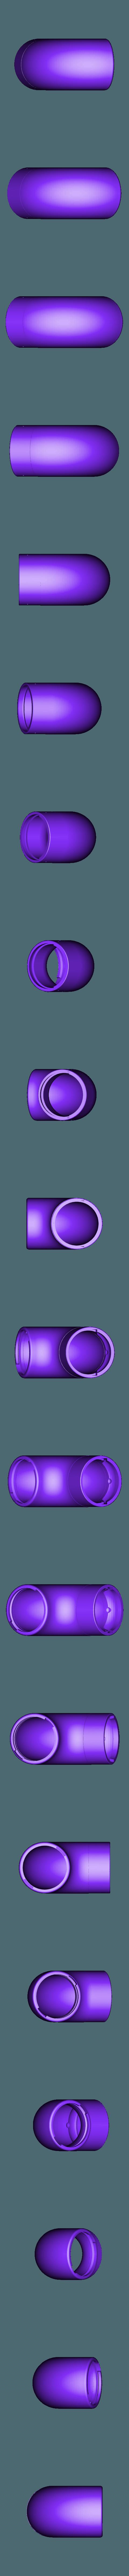 AST-ExhaustTubeLockTabs.stl Download free STL file HEPA Air Filter Scrubber Tower • 3D print design, DuaneIndeed